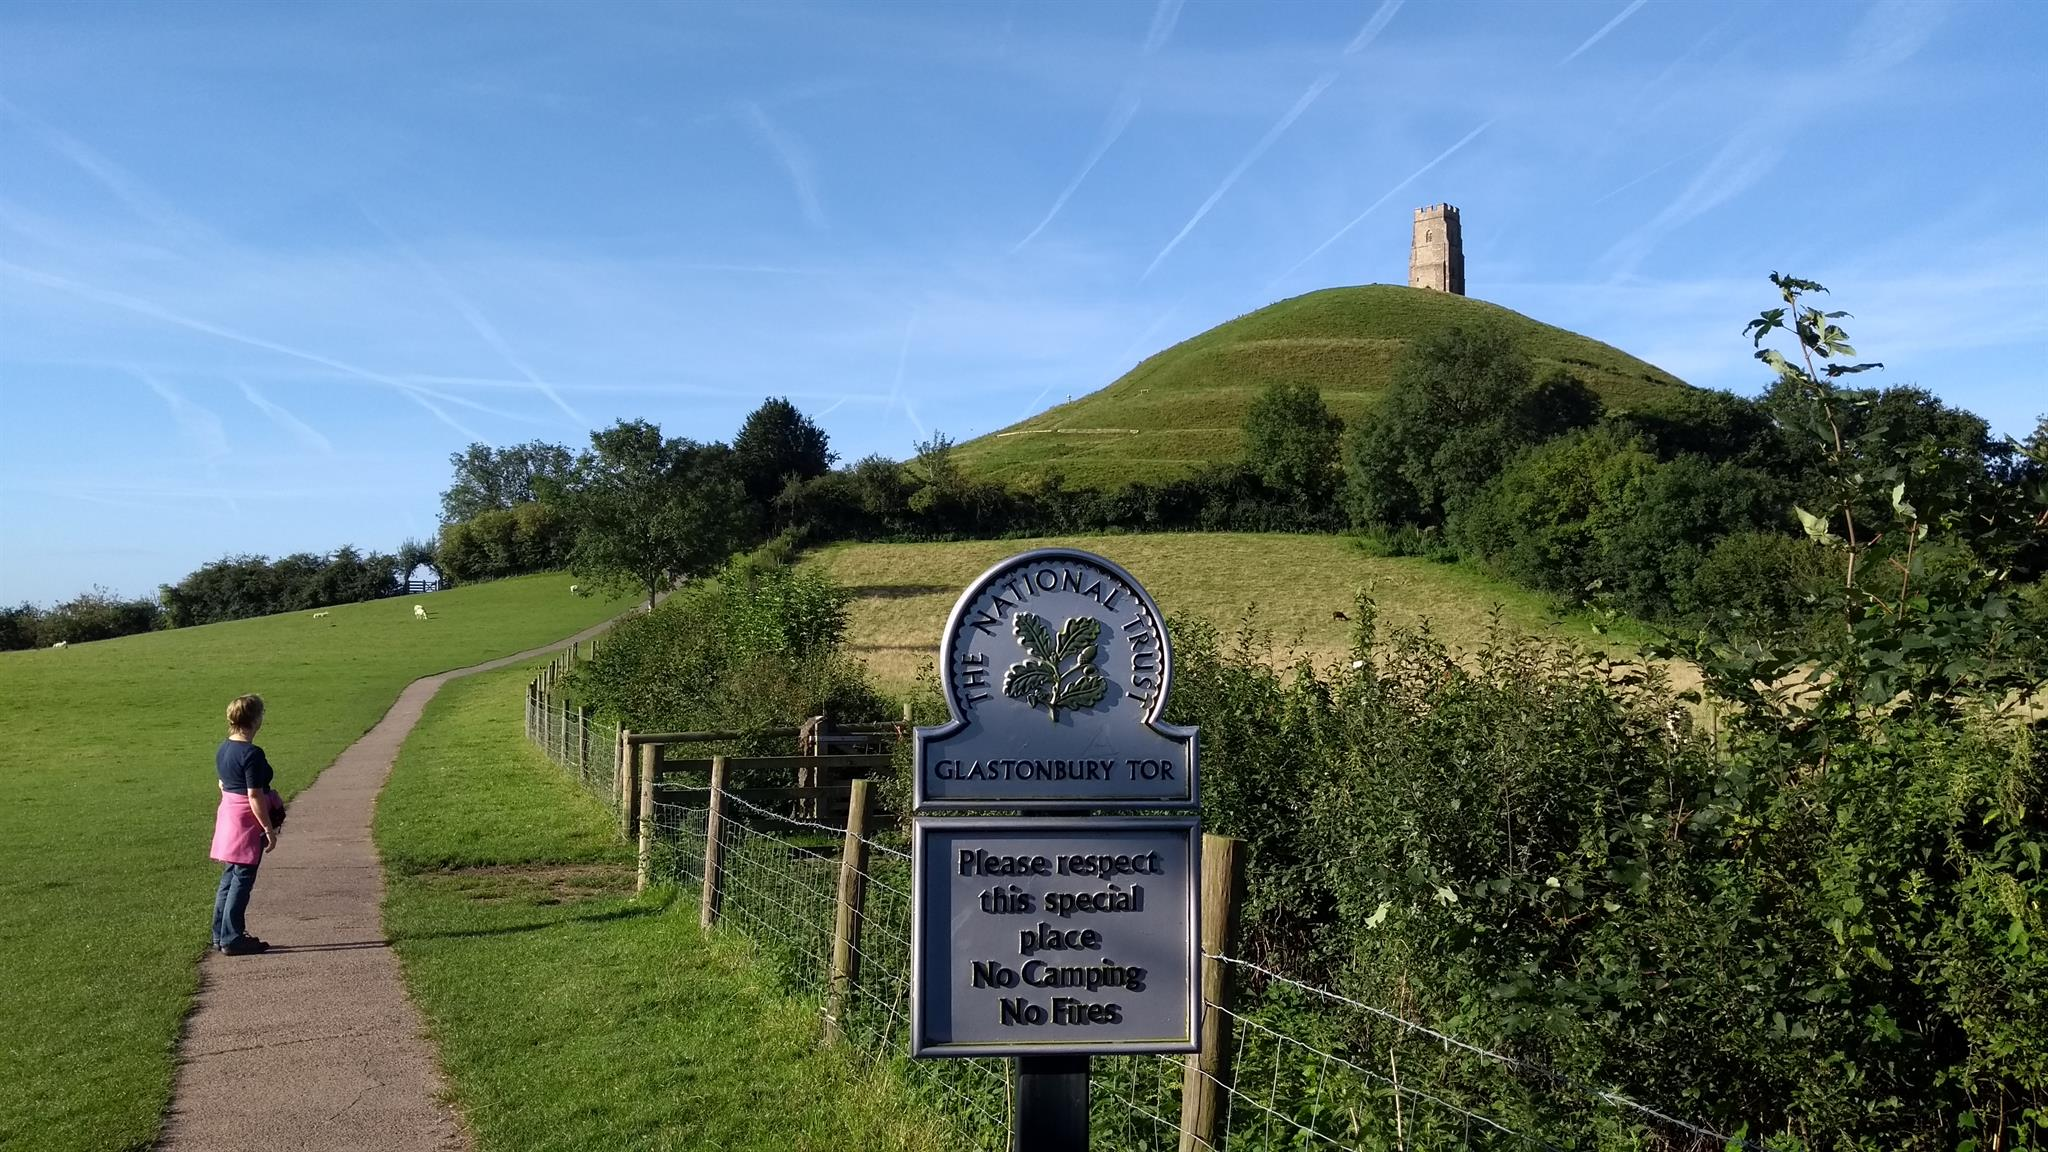 Glastonbury Tor - Peakbagger.com